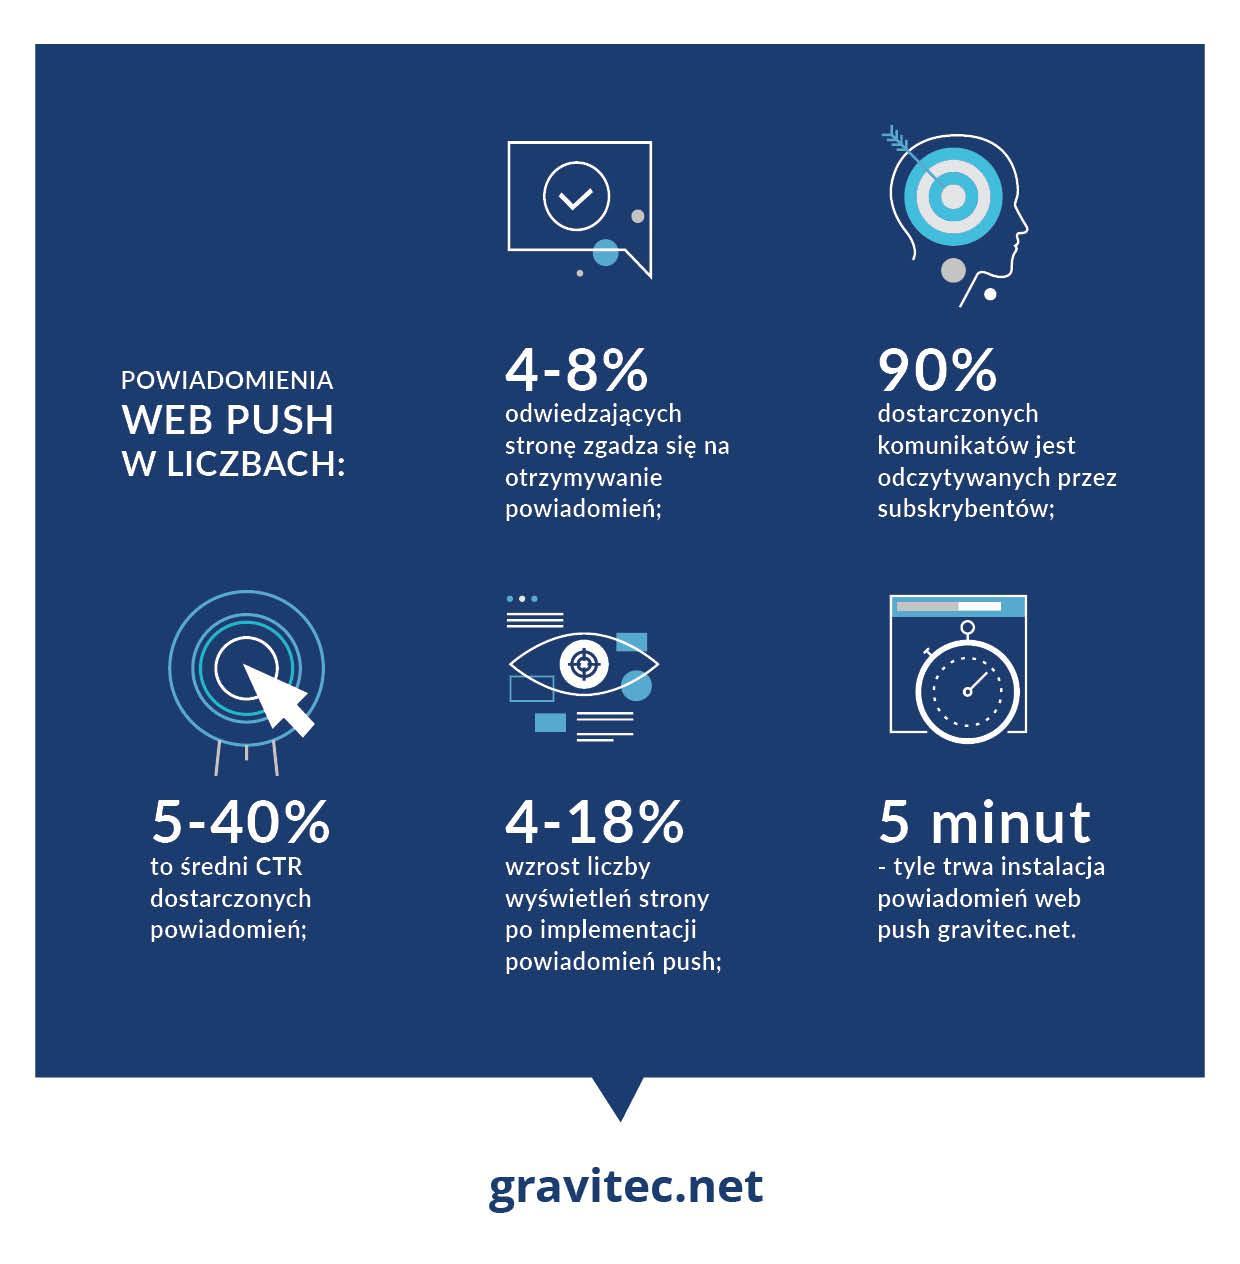 gravitec.net